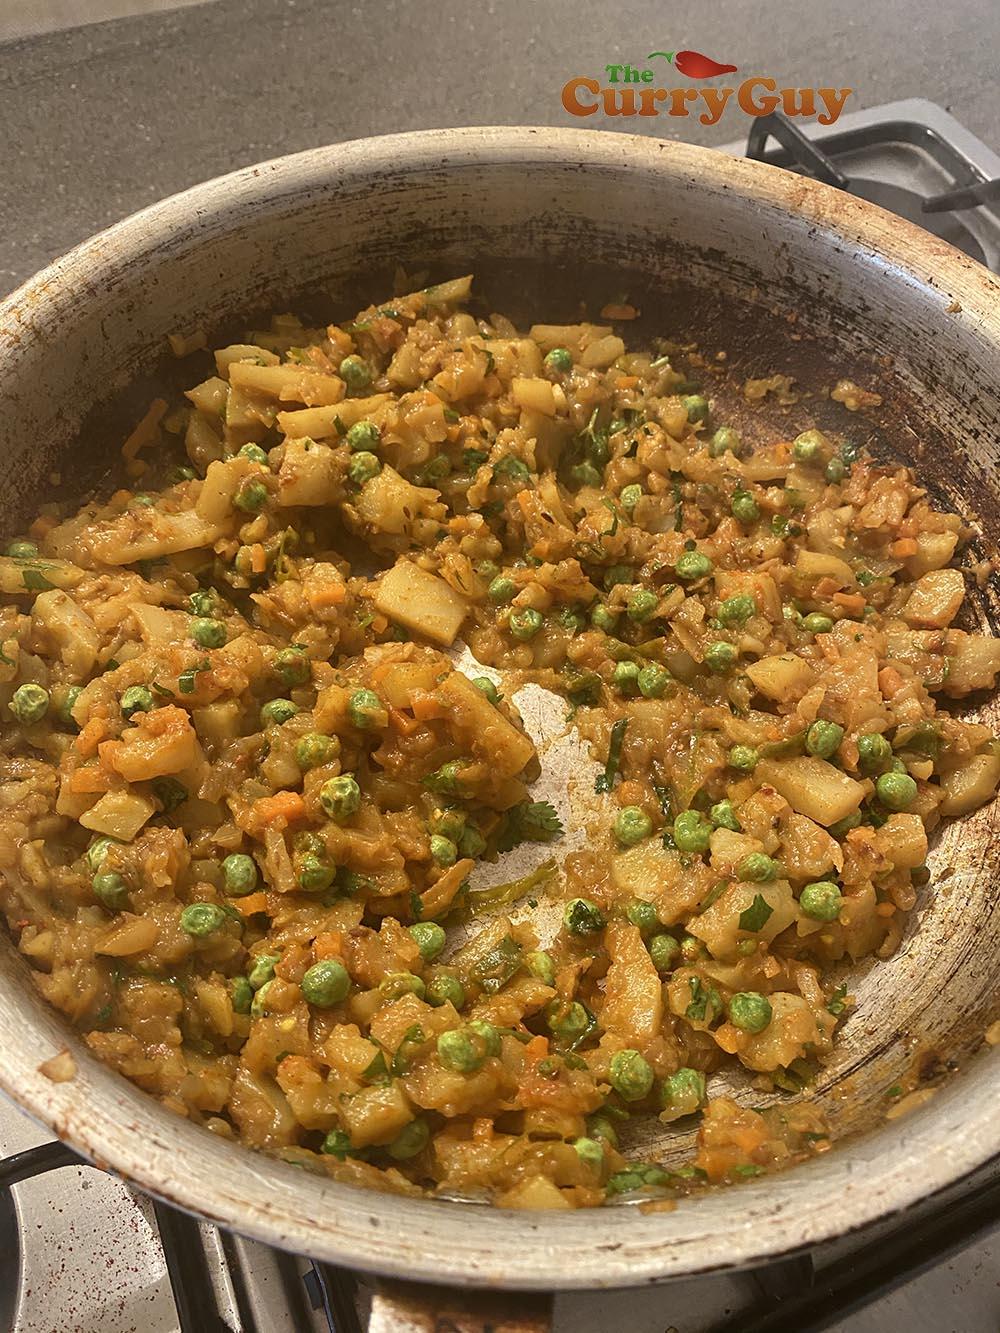 Adding peas